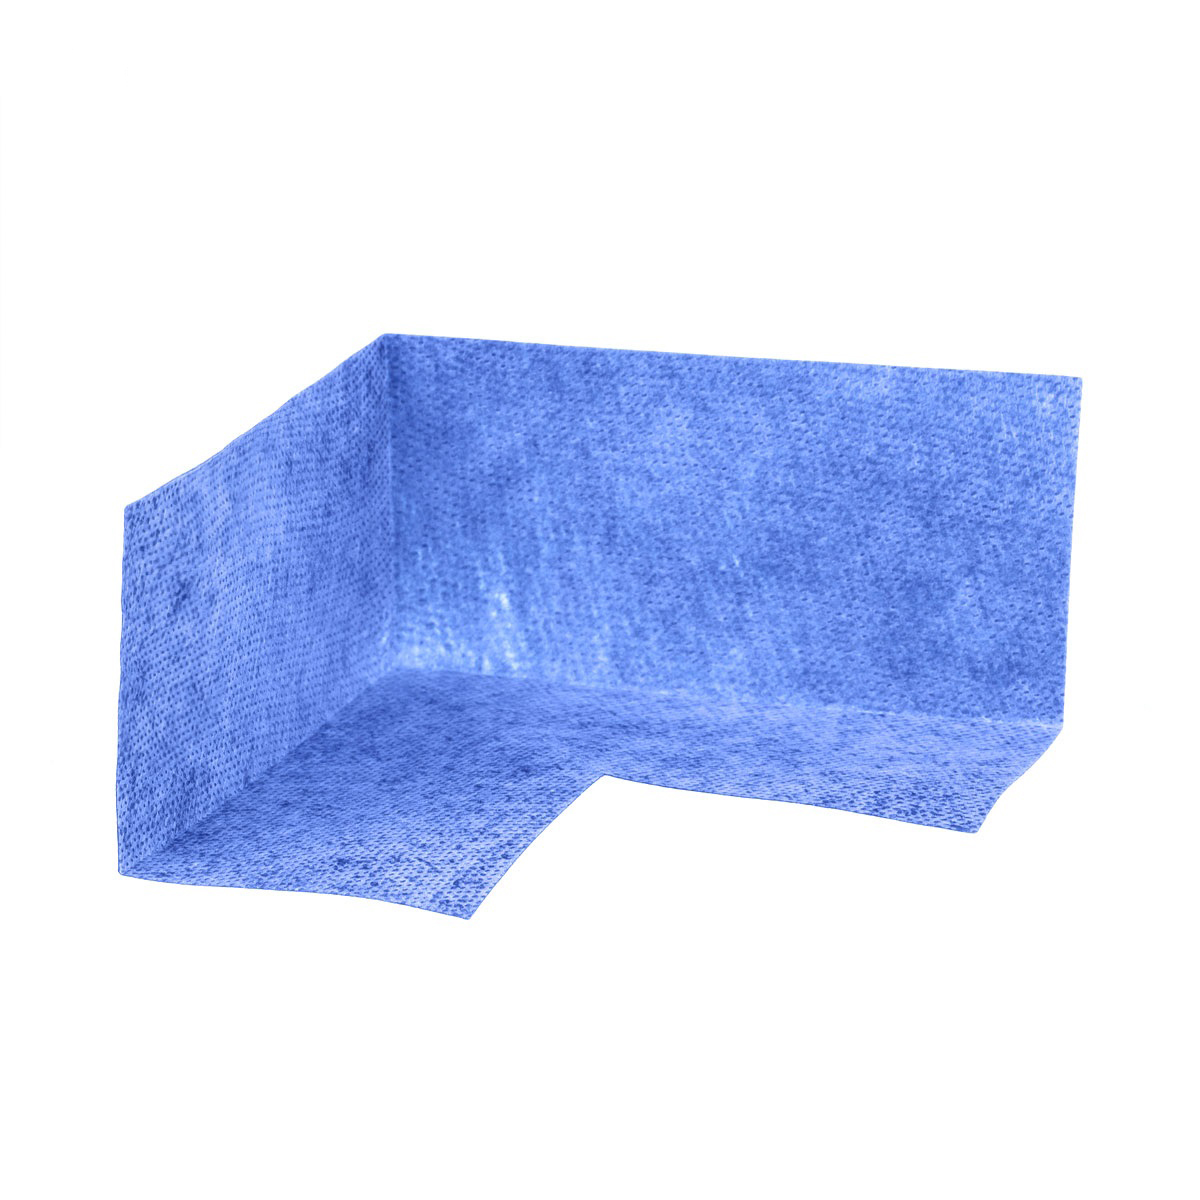 fl ssigfolie dichtband duschelement badabdichtung duschabdichtung bad dusche ebay. Black Bedroom Furniture Sets. Home Design Ideas